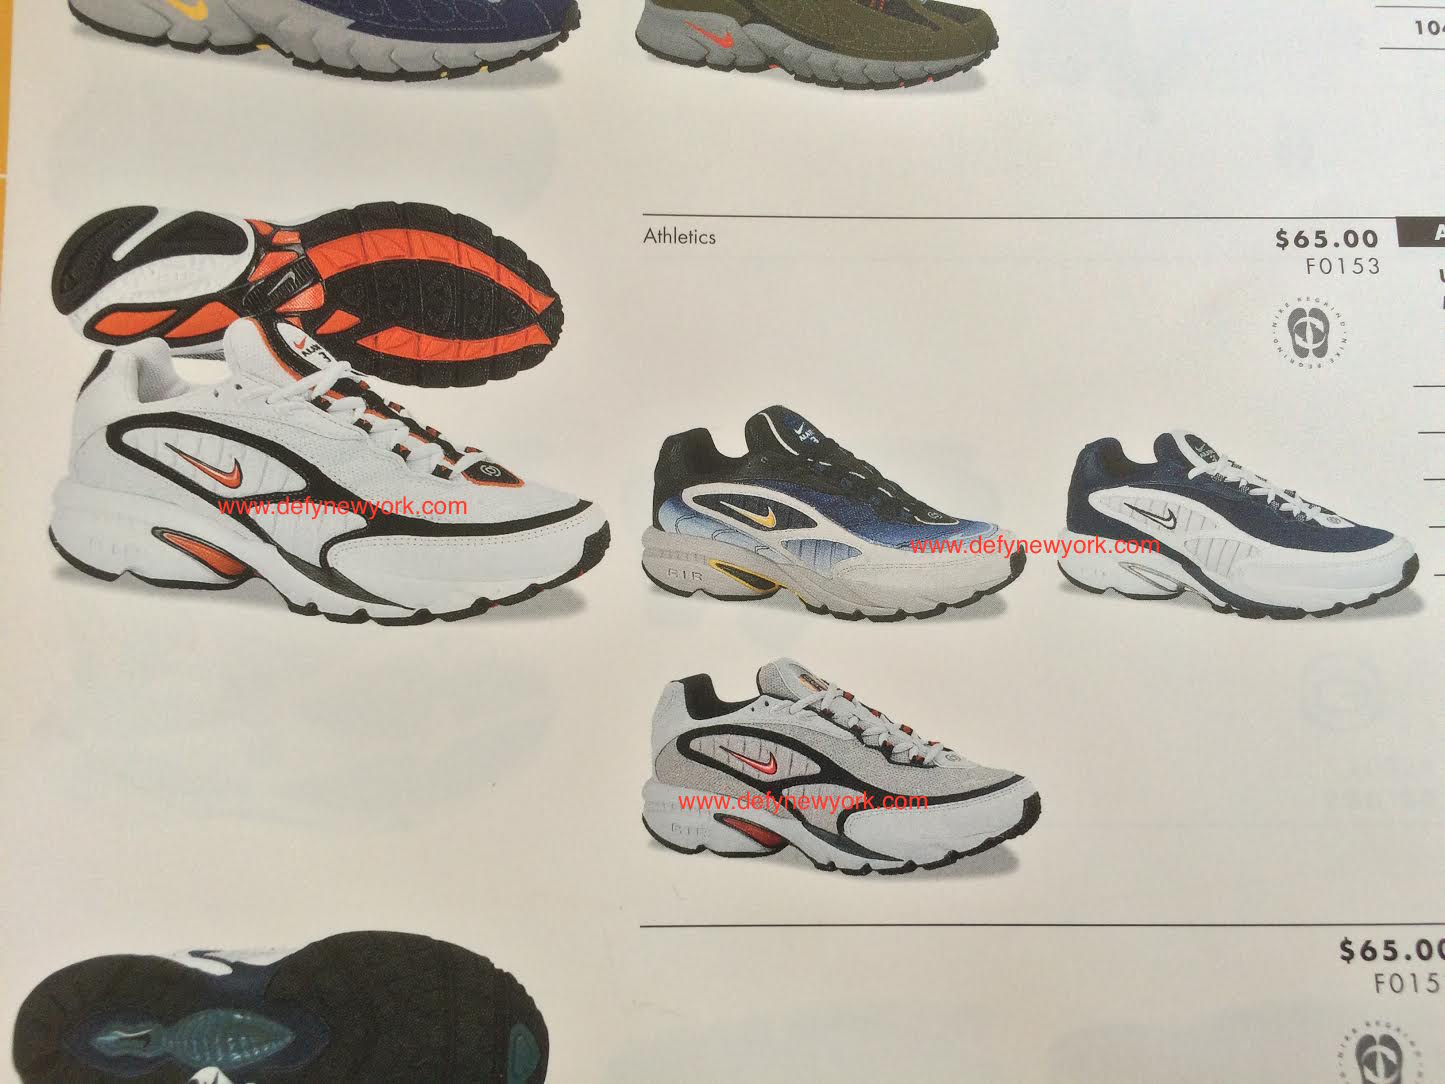 Alate Sneakers – 2000 Nike Air music York 3 Shoe DefyNew Running 6gvIbf7mYy